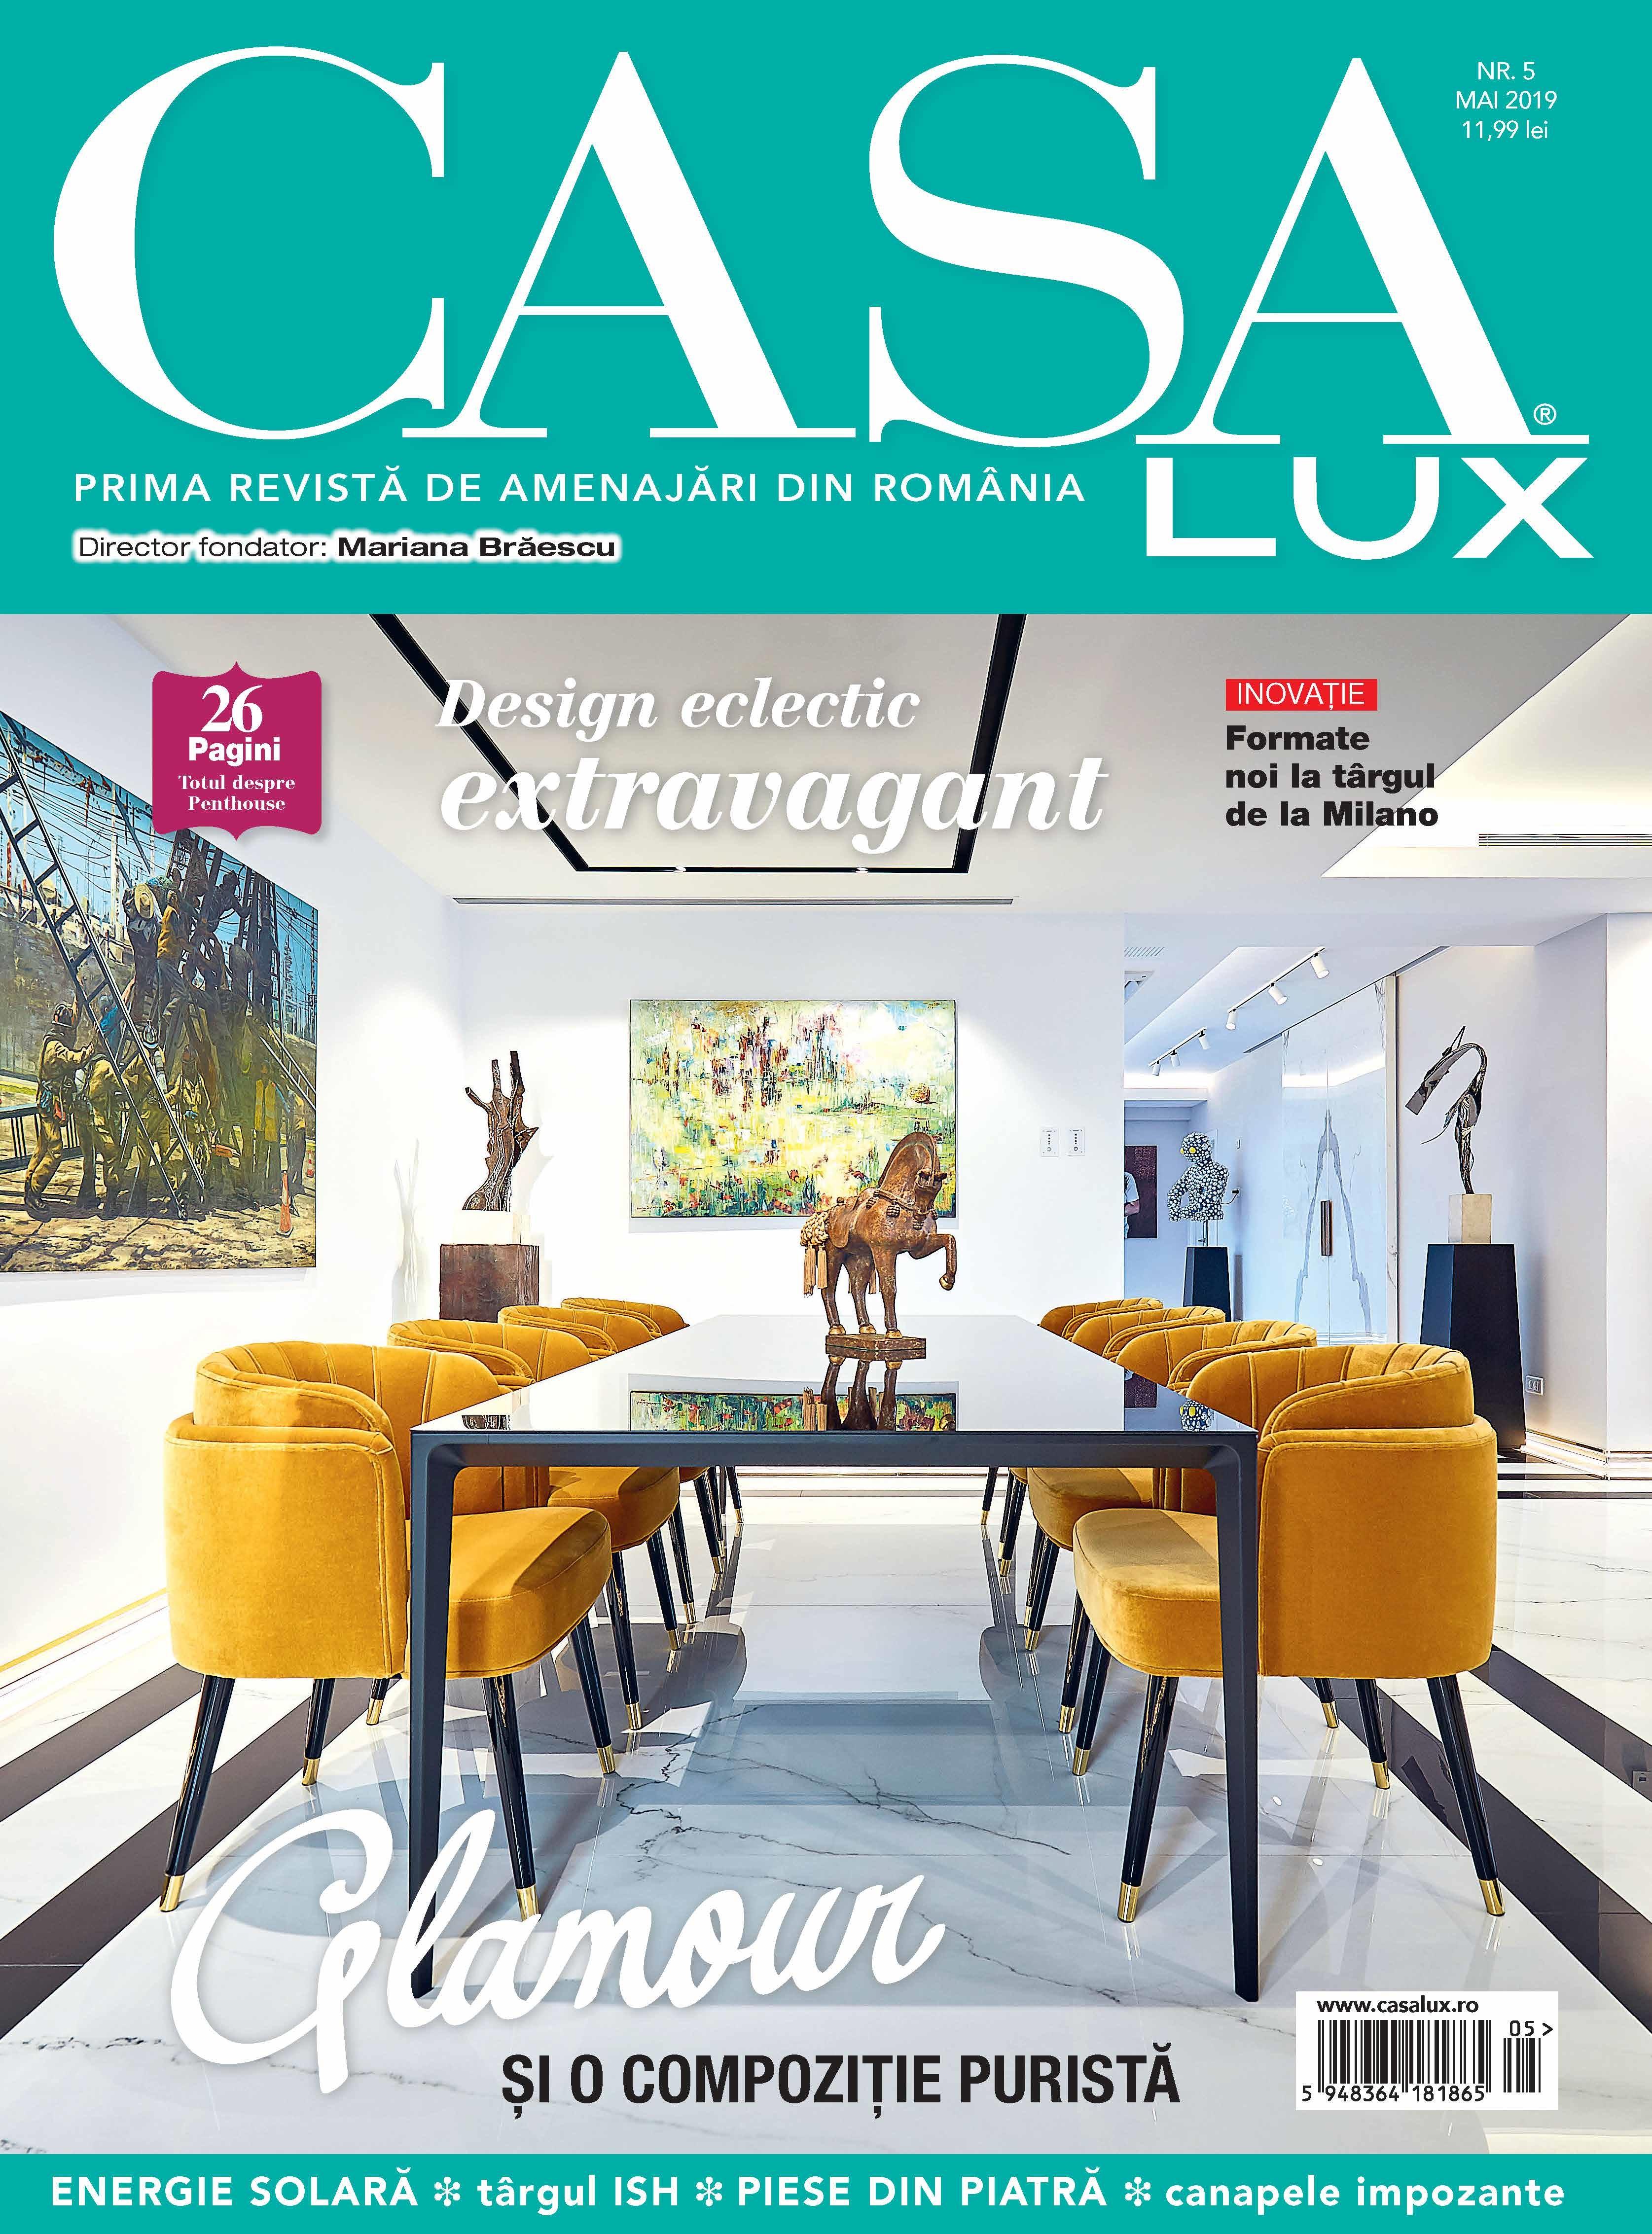 Casa Lux 05-2019